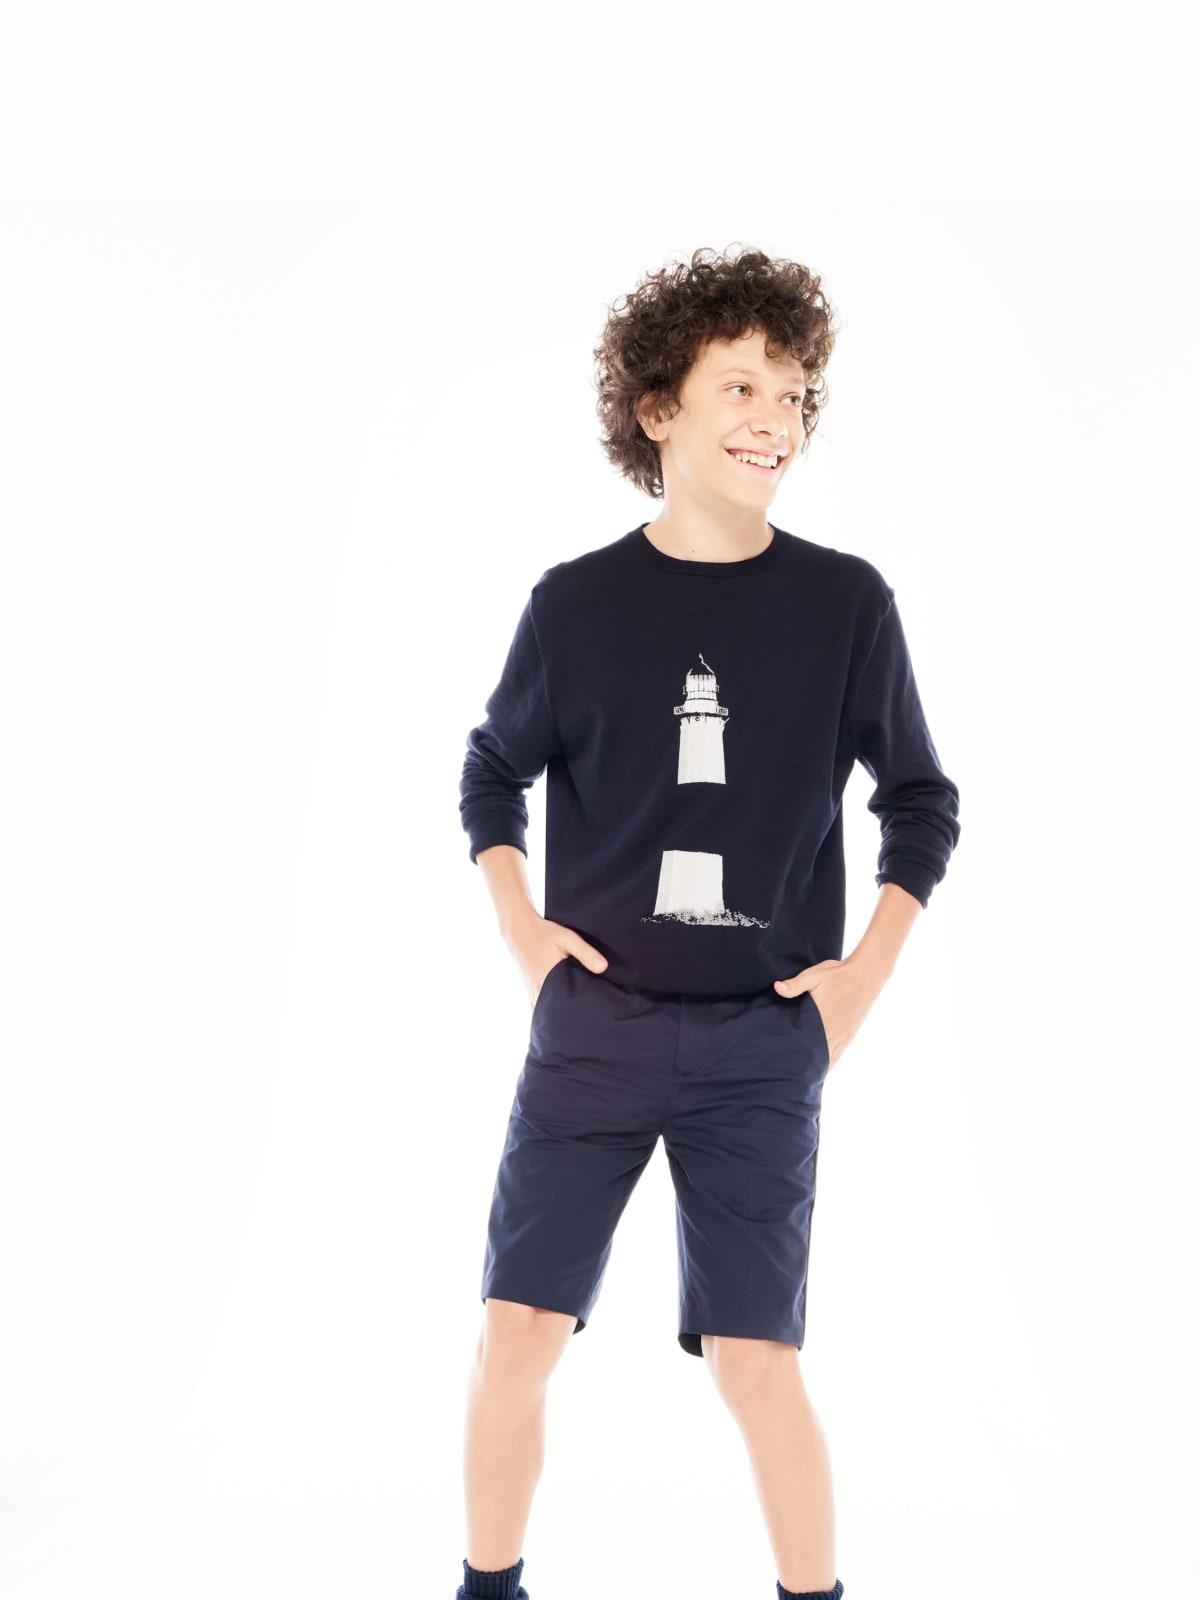 J.Crew 2017 spring collection menswear